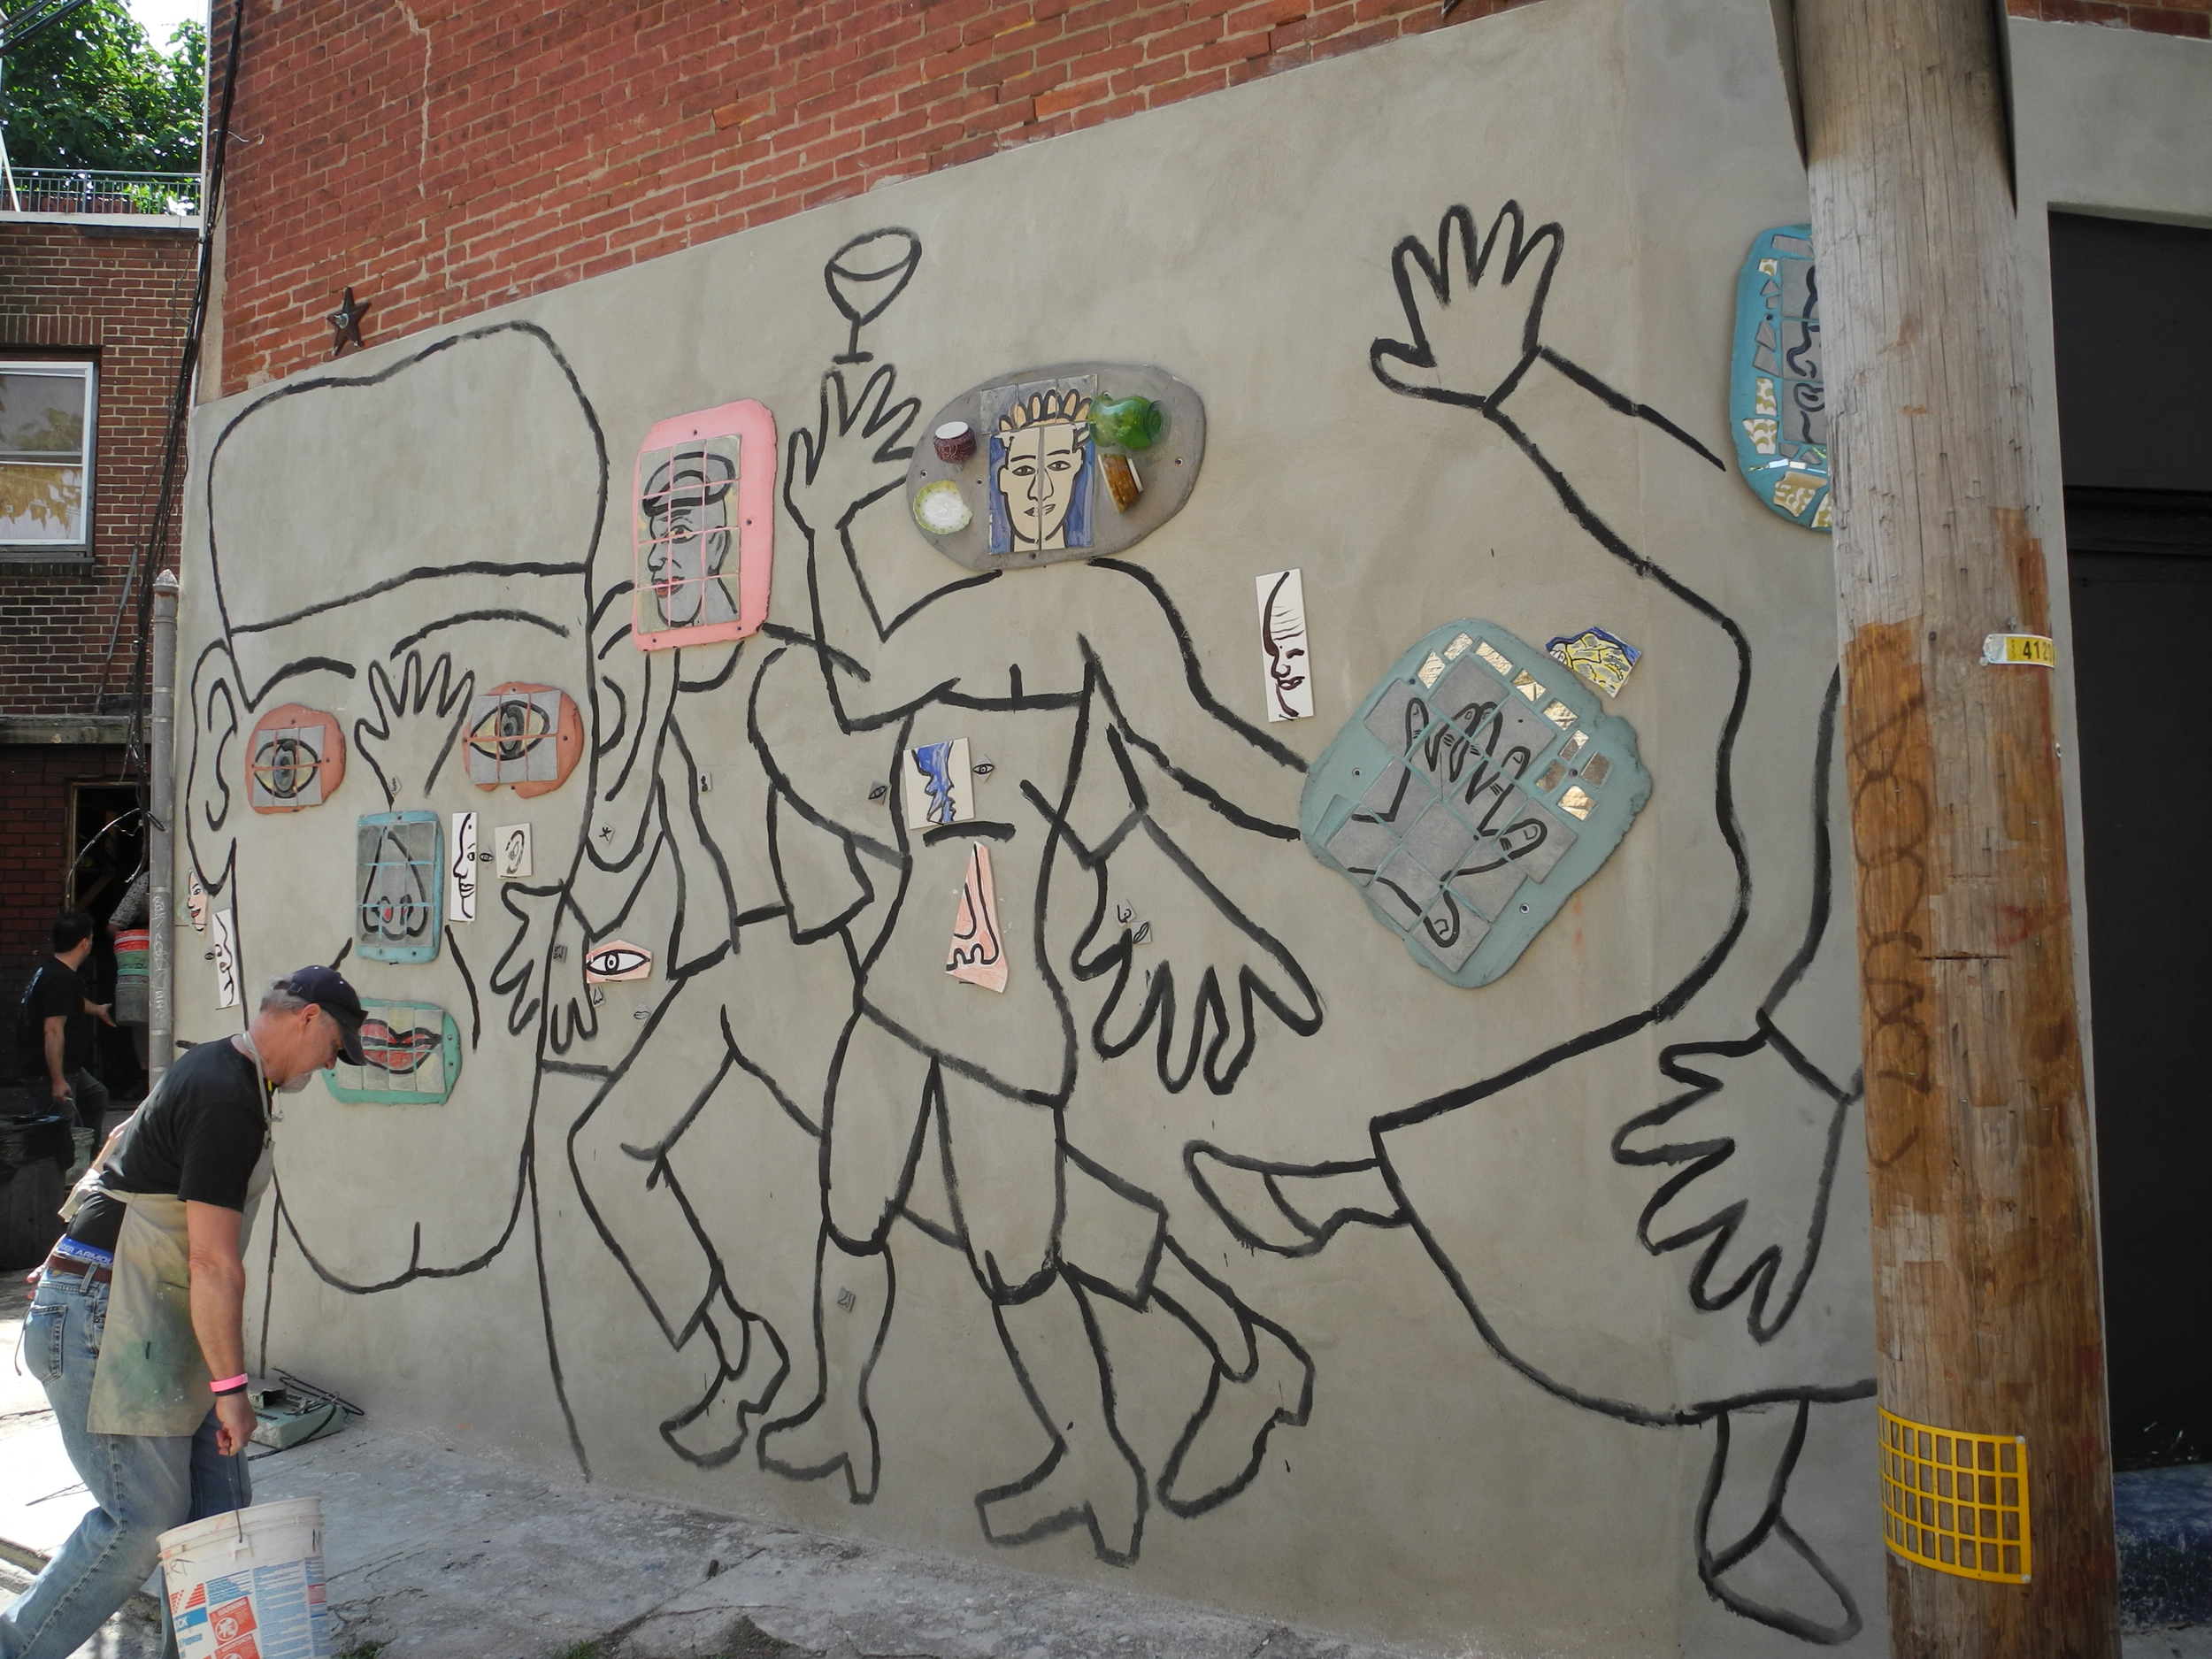 Isaiah Zagar Mosaic Mural Workshop